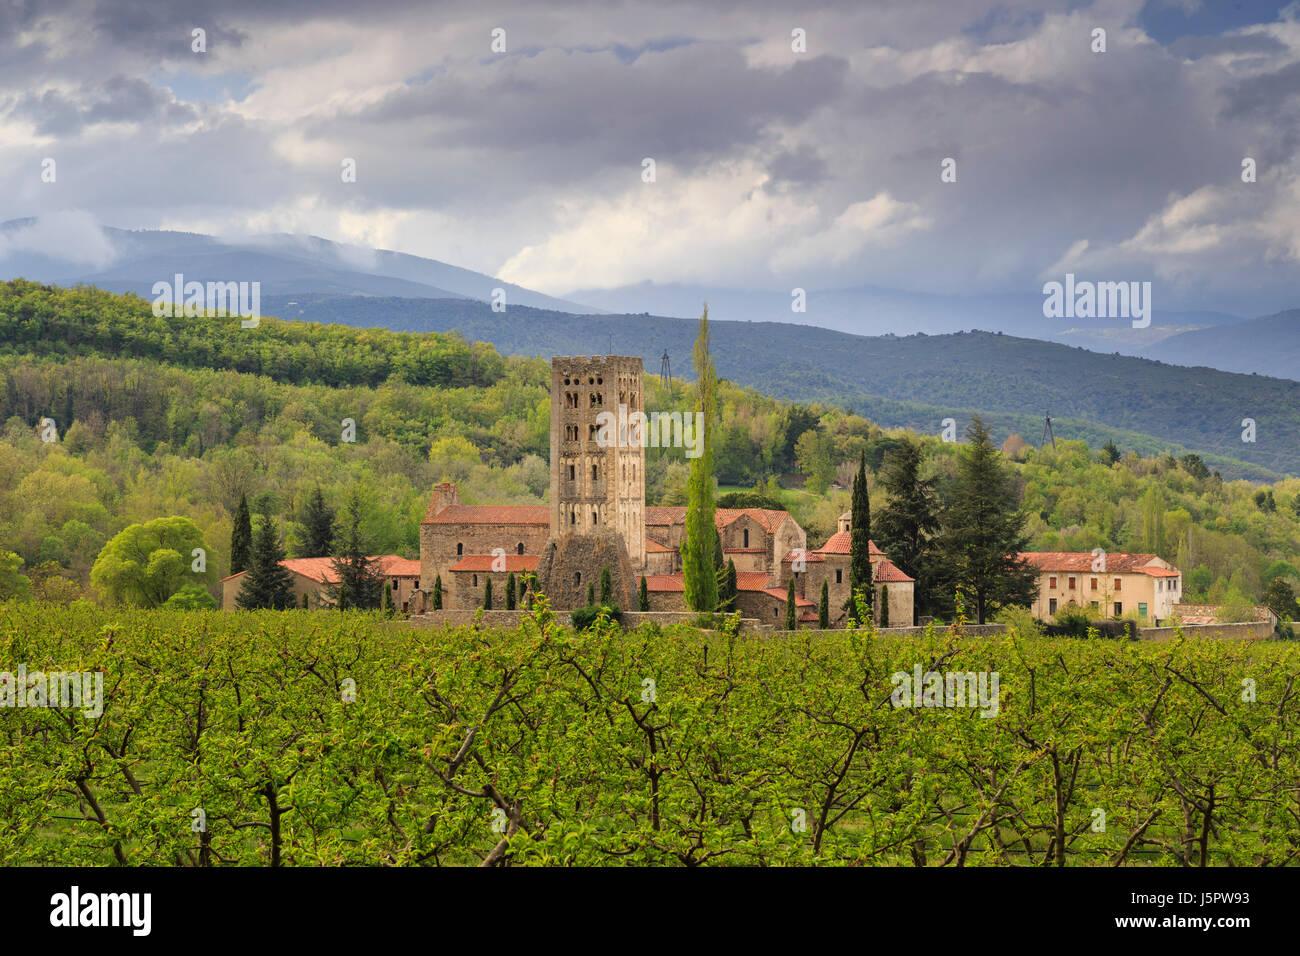 France, Pyrénées-Orientales (66), Codalet, abbaye de Saint-Michel de Cuxa // France, Pyrenees Orientales, Photo Stock